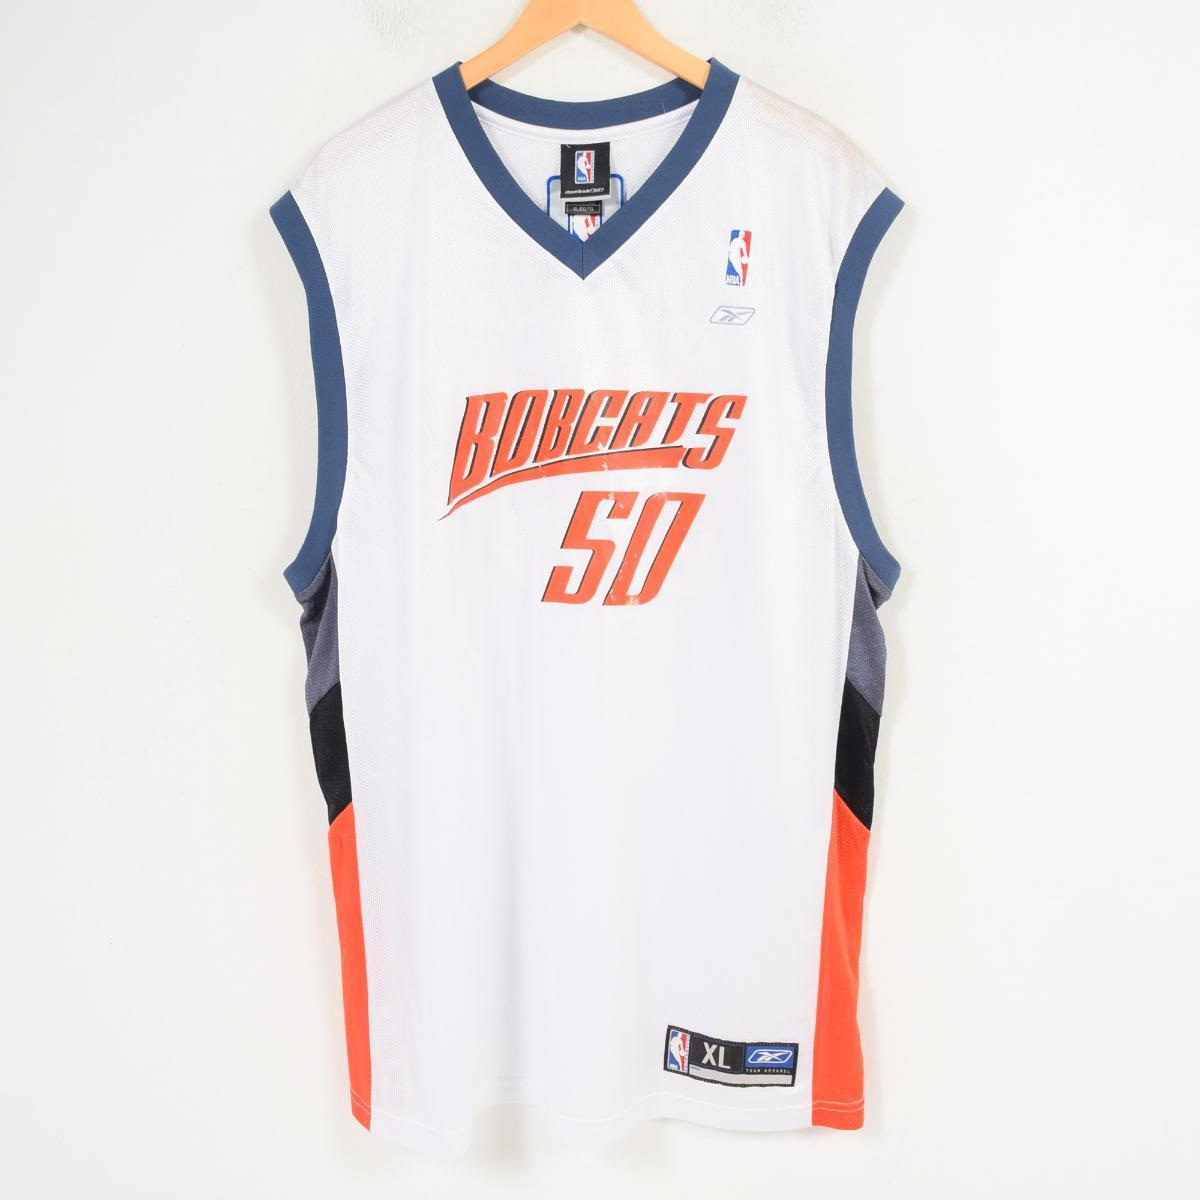 new styles 17abc 70856 DEADSTOCK dead stock Reebok Reebok NBA CHARLOTTE BOBCSTS Charlotte Bobcats  game shirt replica uniform men XL /wap0662